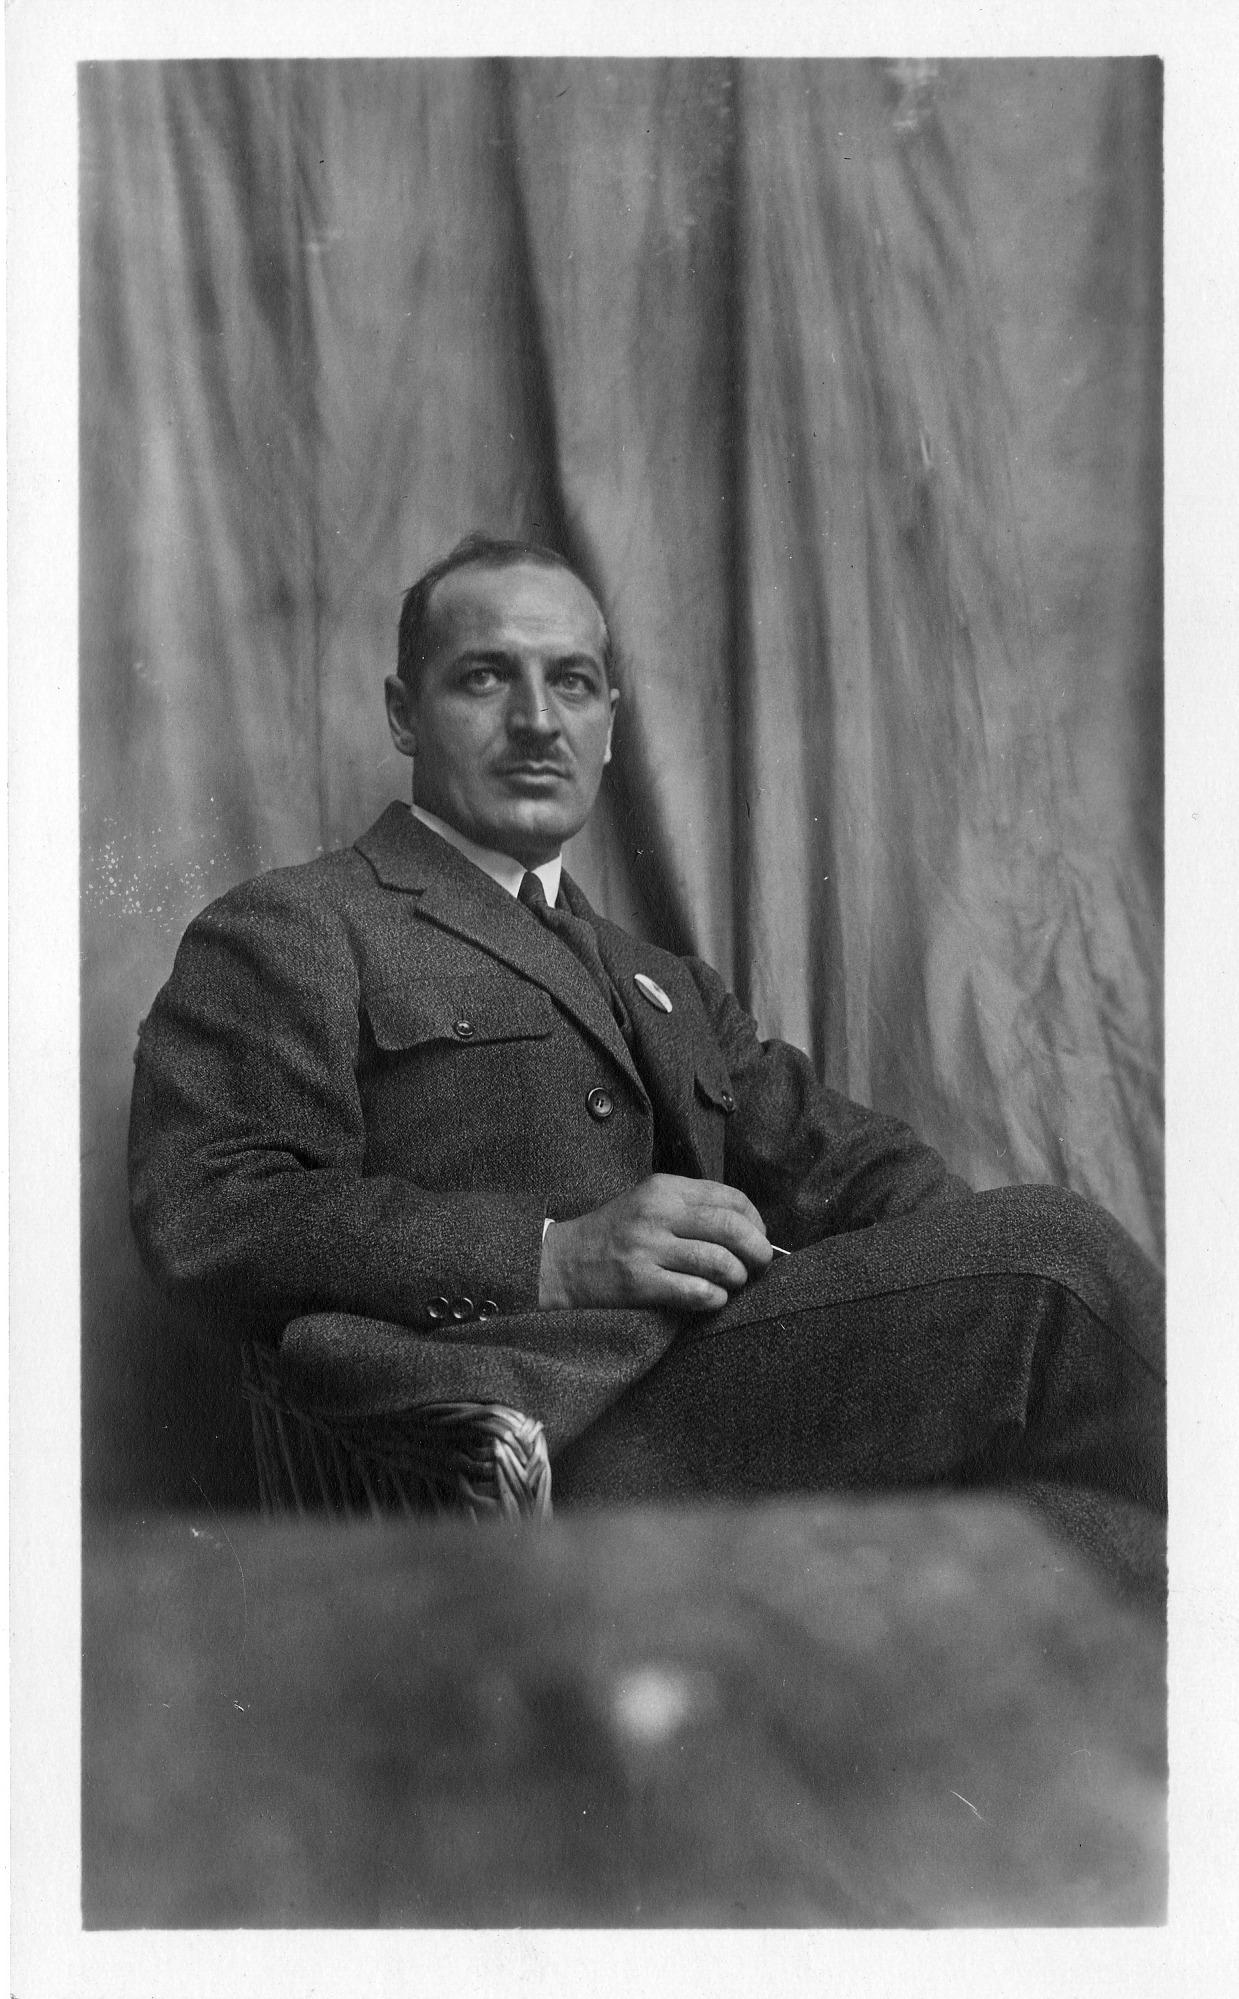 Prosper E. Cholet (b. 1887), Smithsonian Institution Archives, SIA Acc. 90-105 [SIA2008-0245].